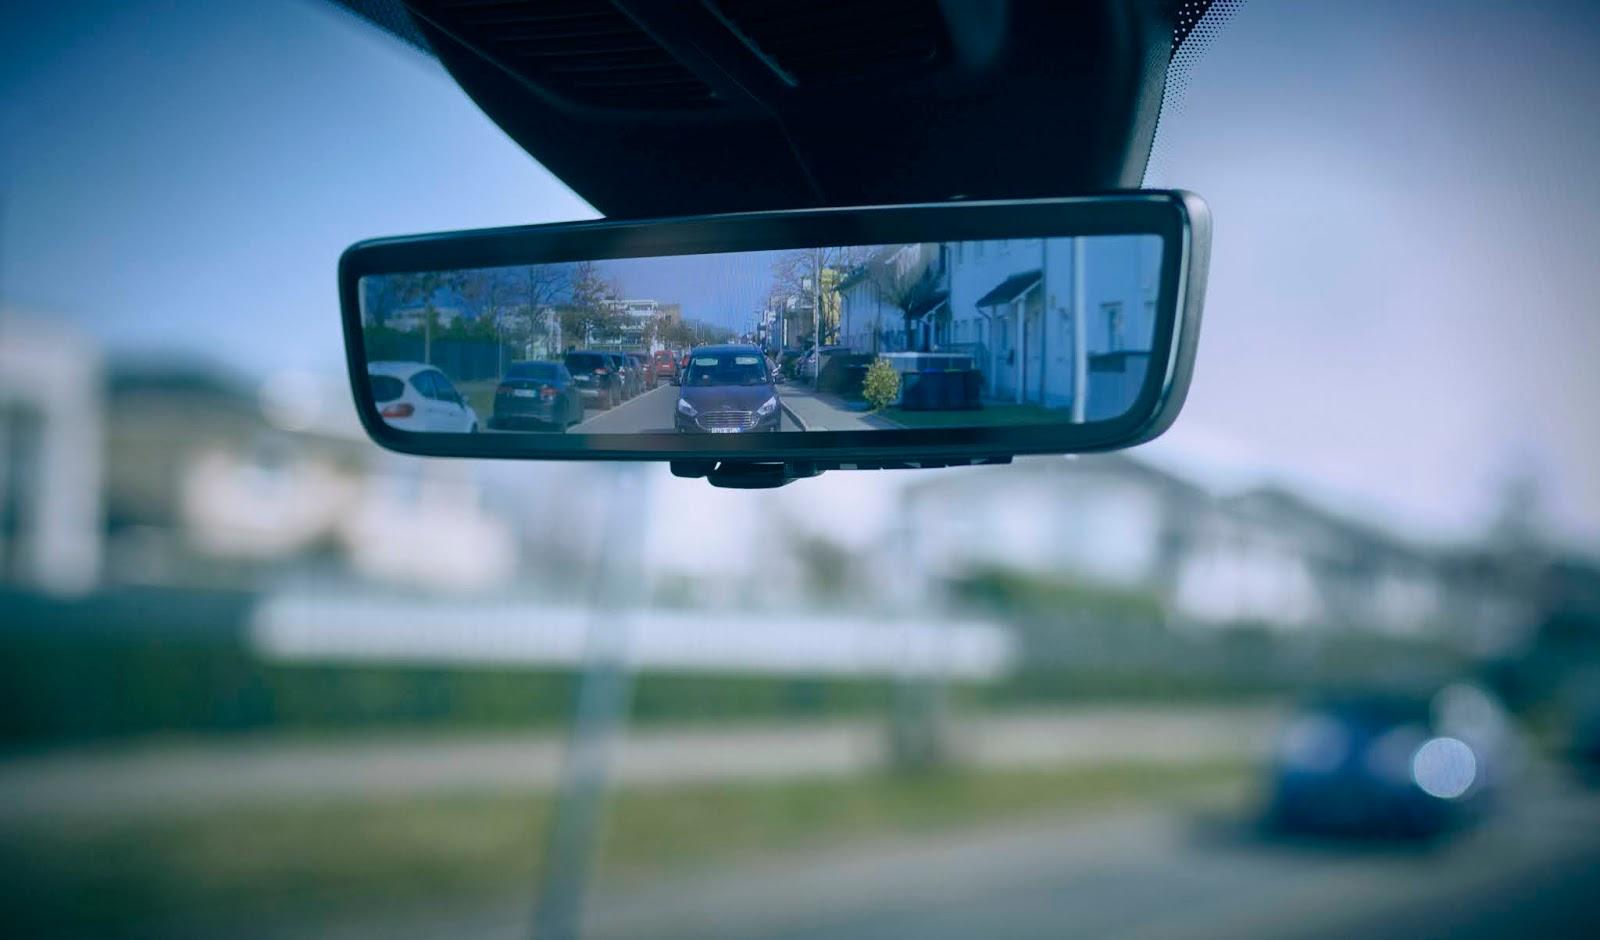 2021 Ford Smart Mirror 2B01